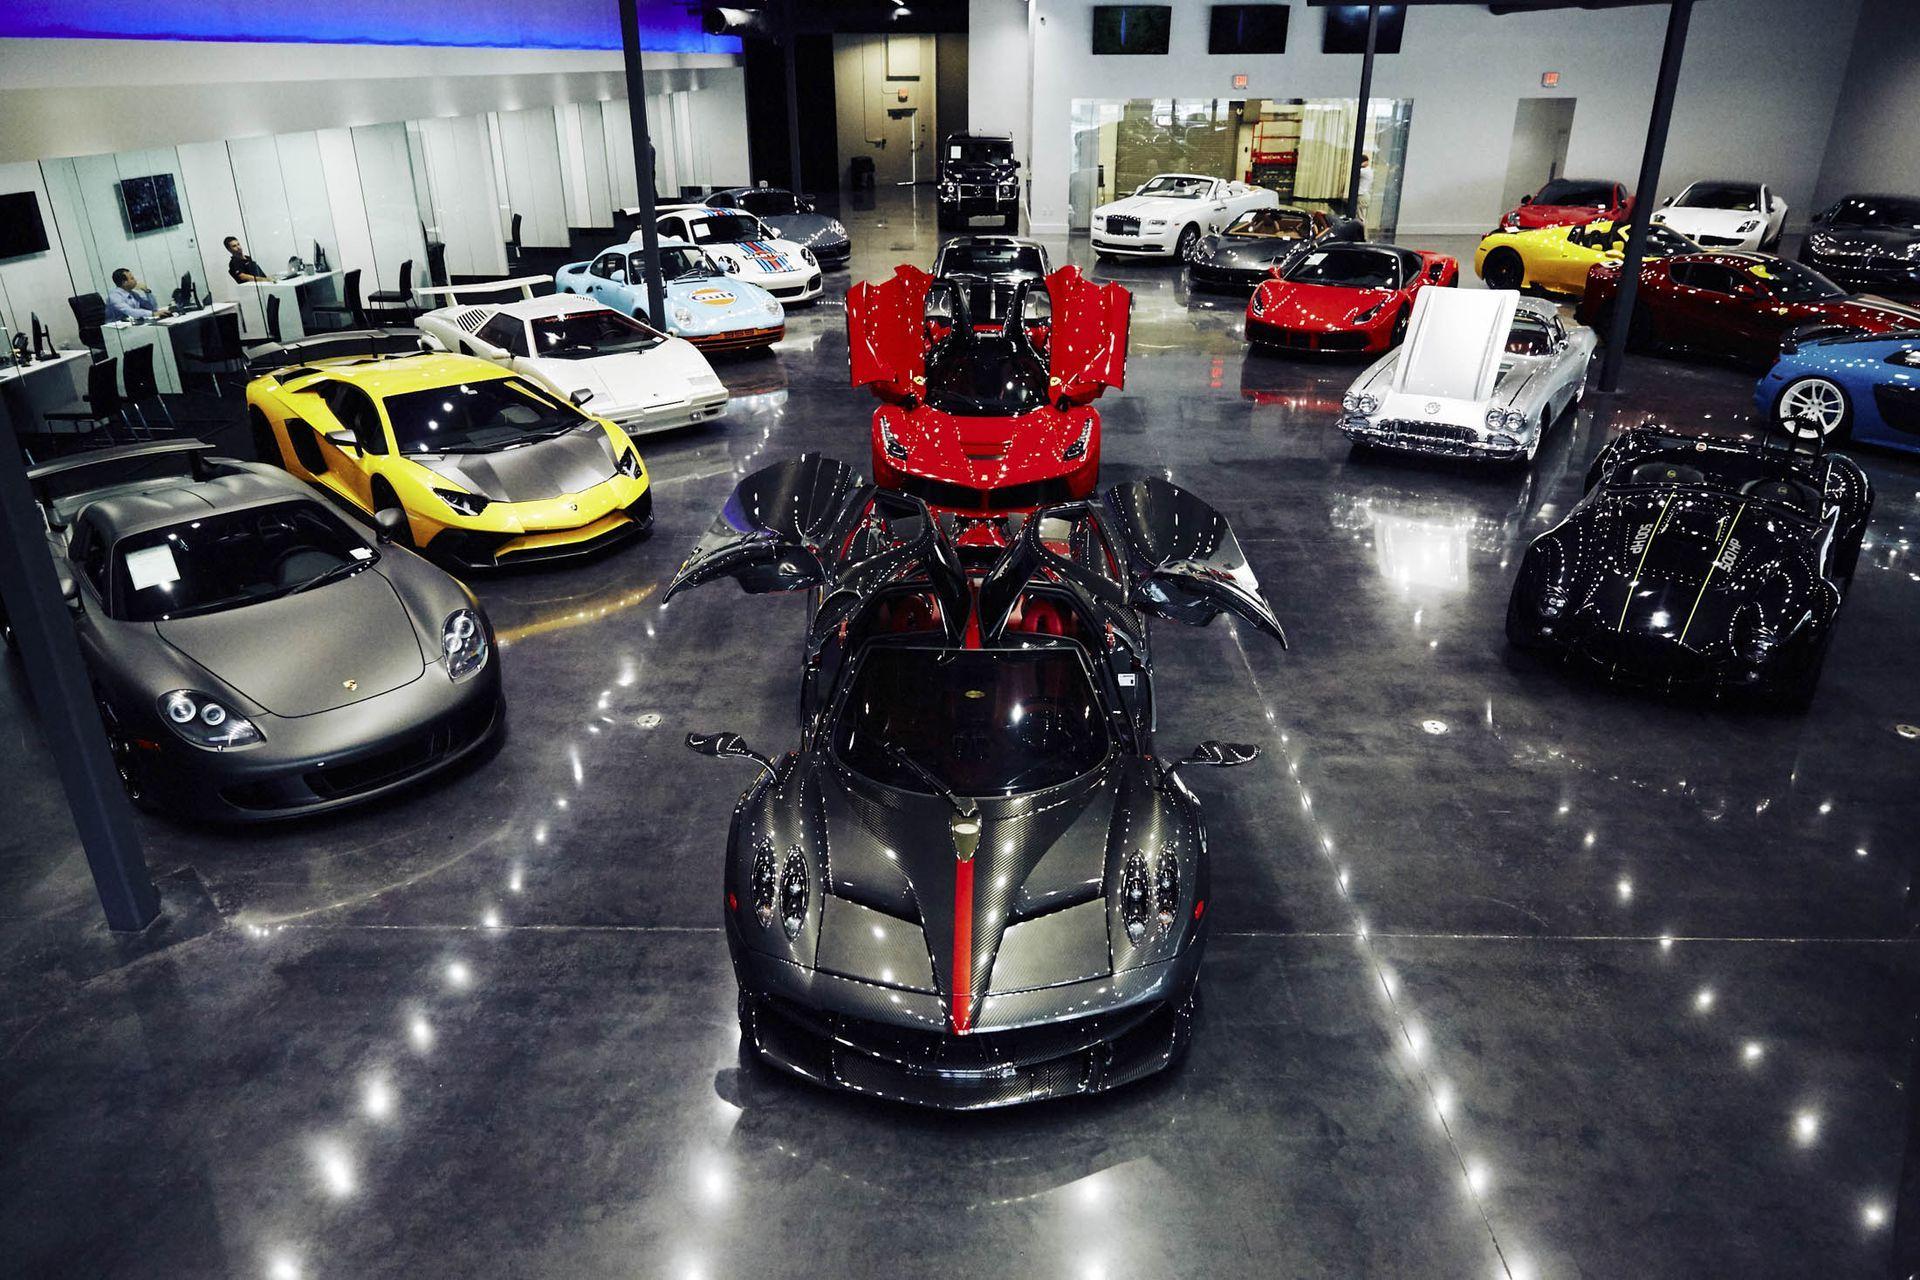 Local Garage Chinese Supercar Dealership Fff Automobile 002 Supercar Dealership Super Cars Automobile